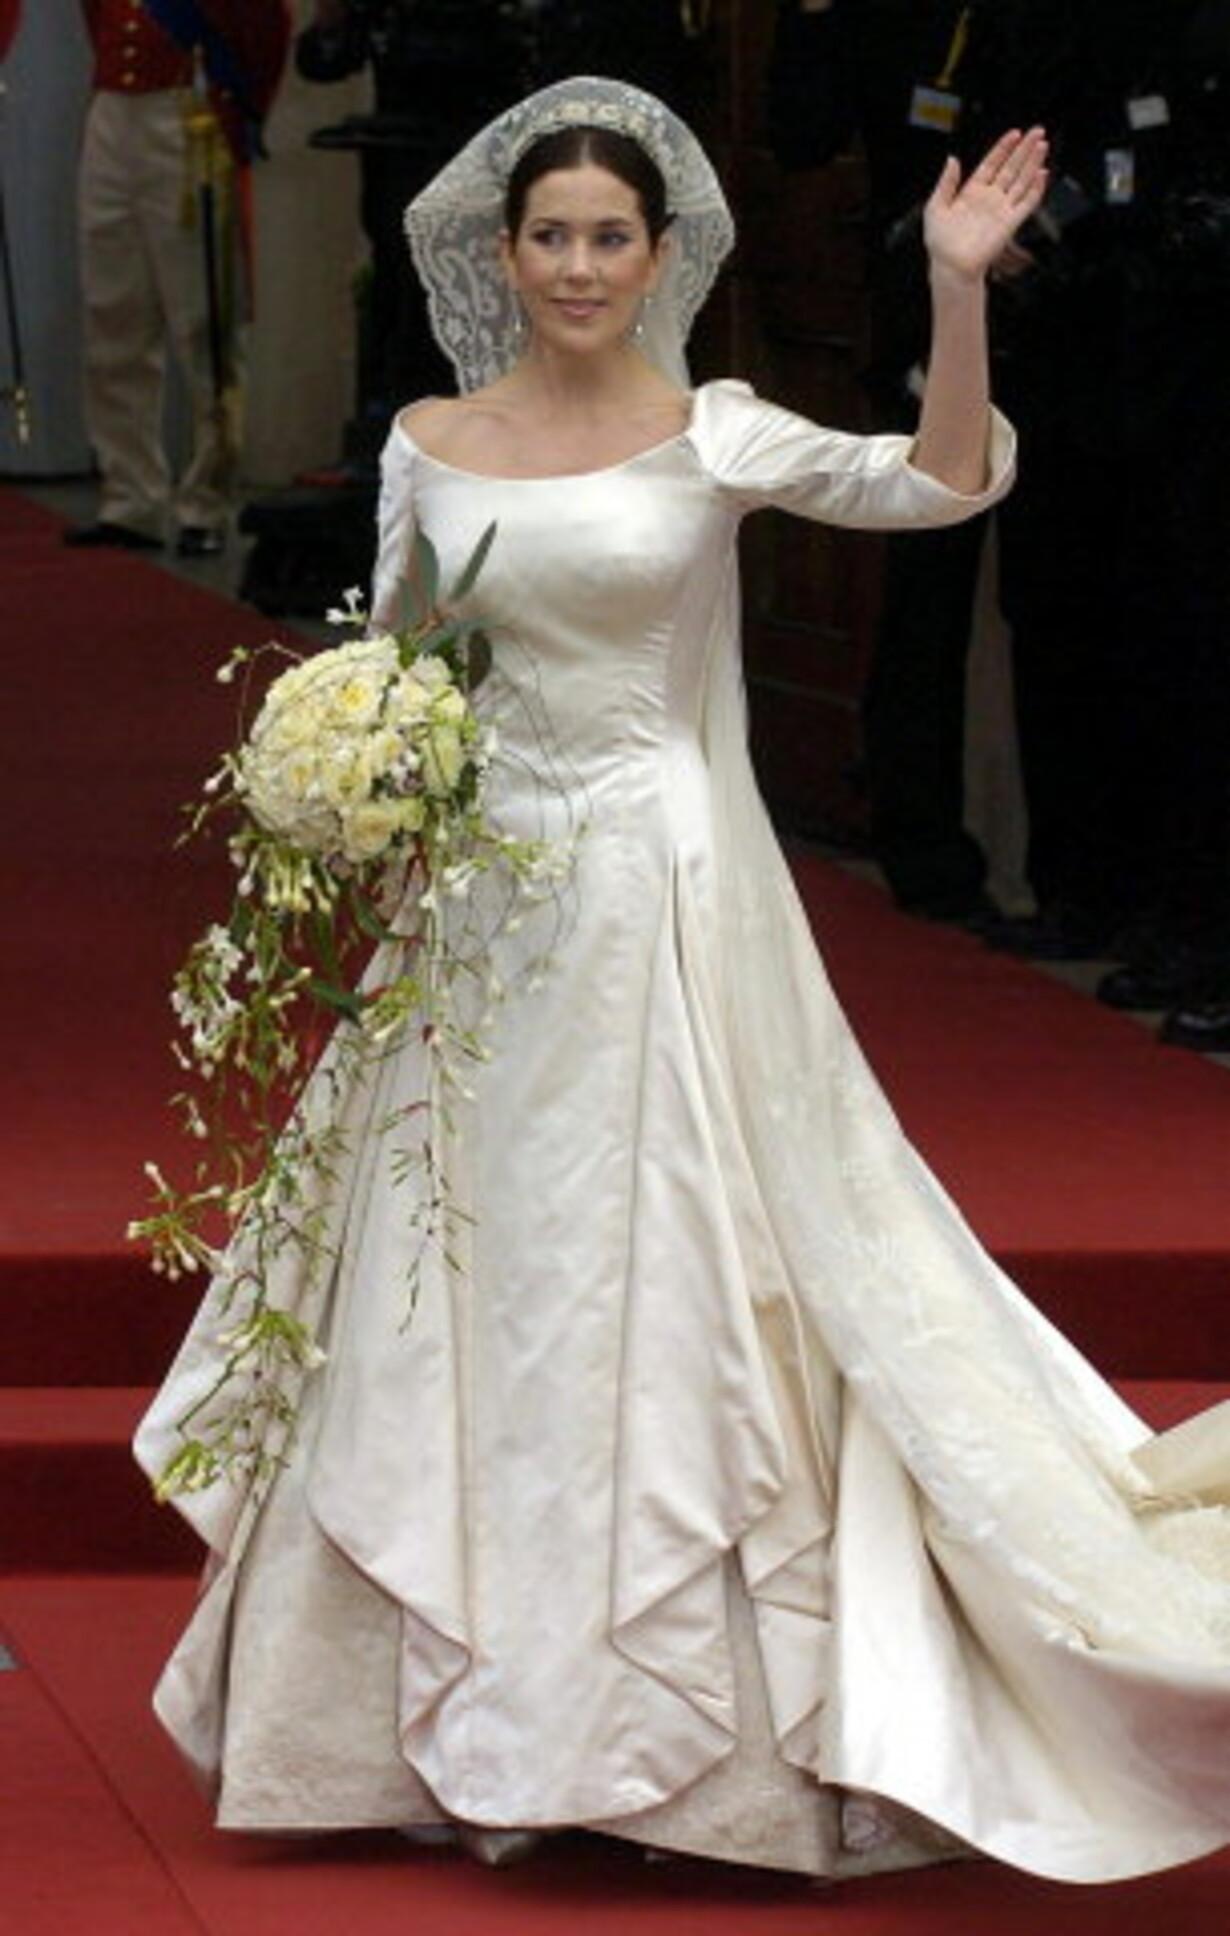 66a6815beb4a Kronprinsesse Marys brudekjole var syet af 60 meter silkeduchesse